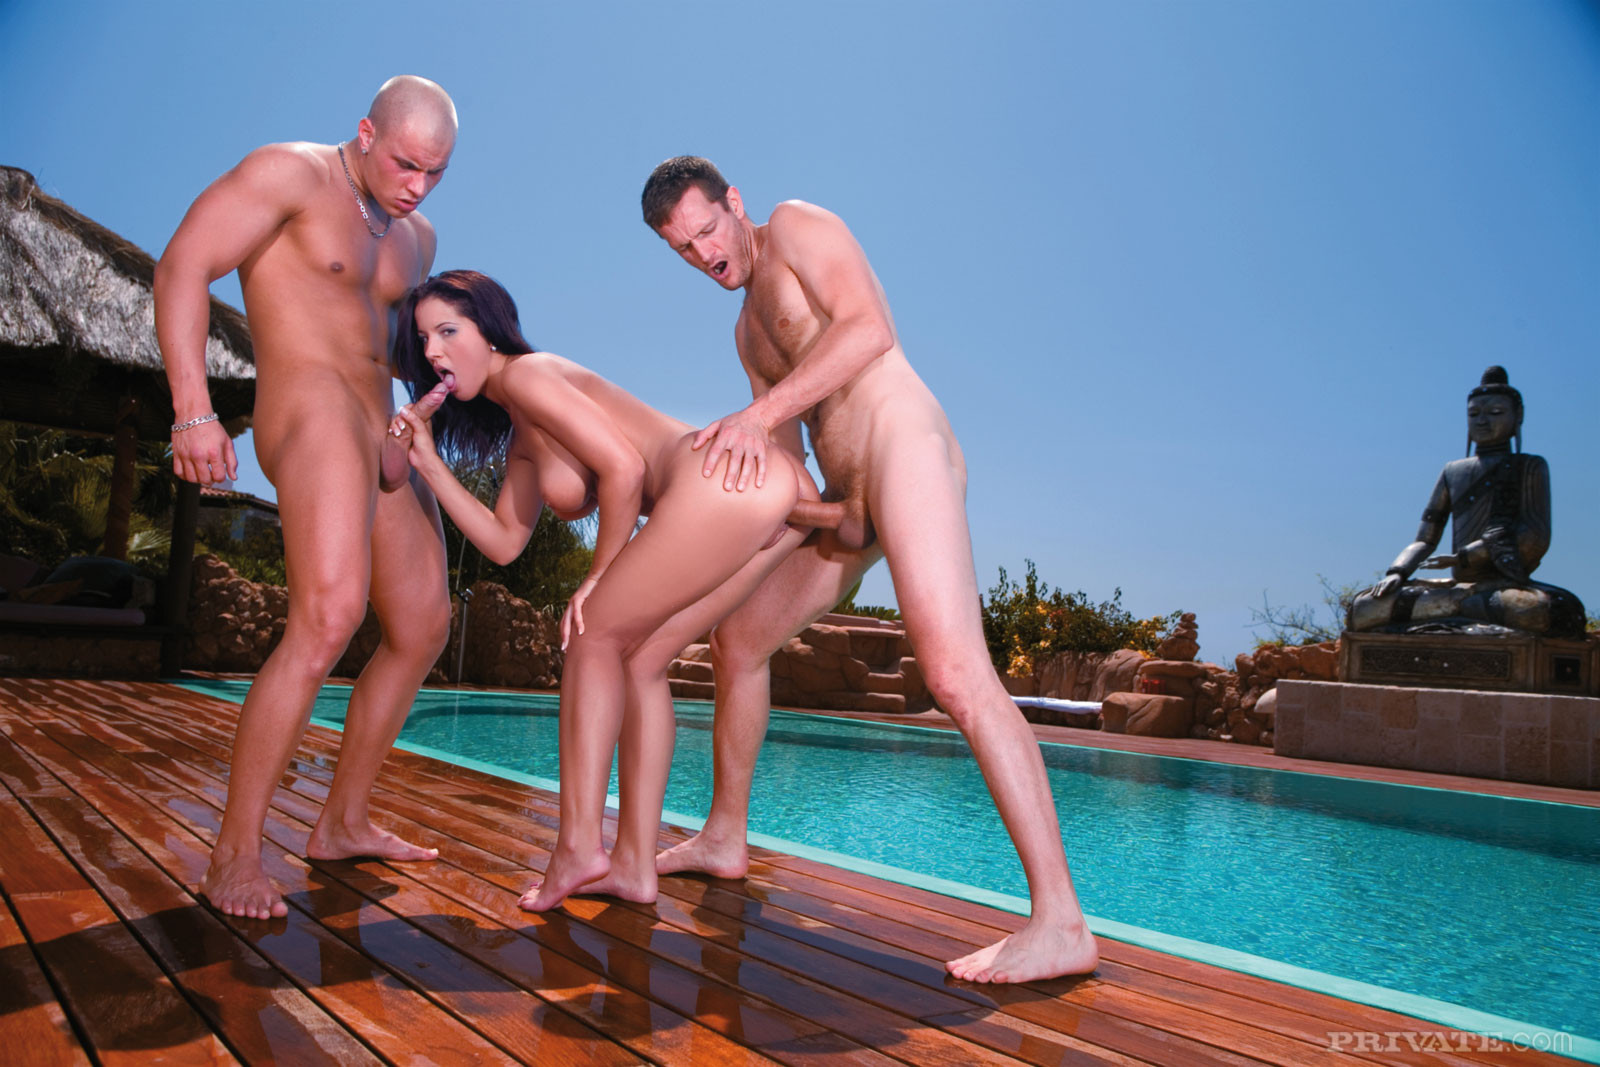 мужчины бассейне групповуха фото ххх так